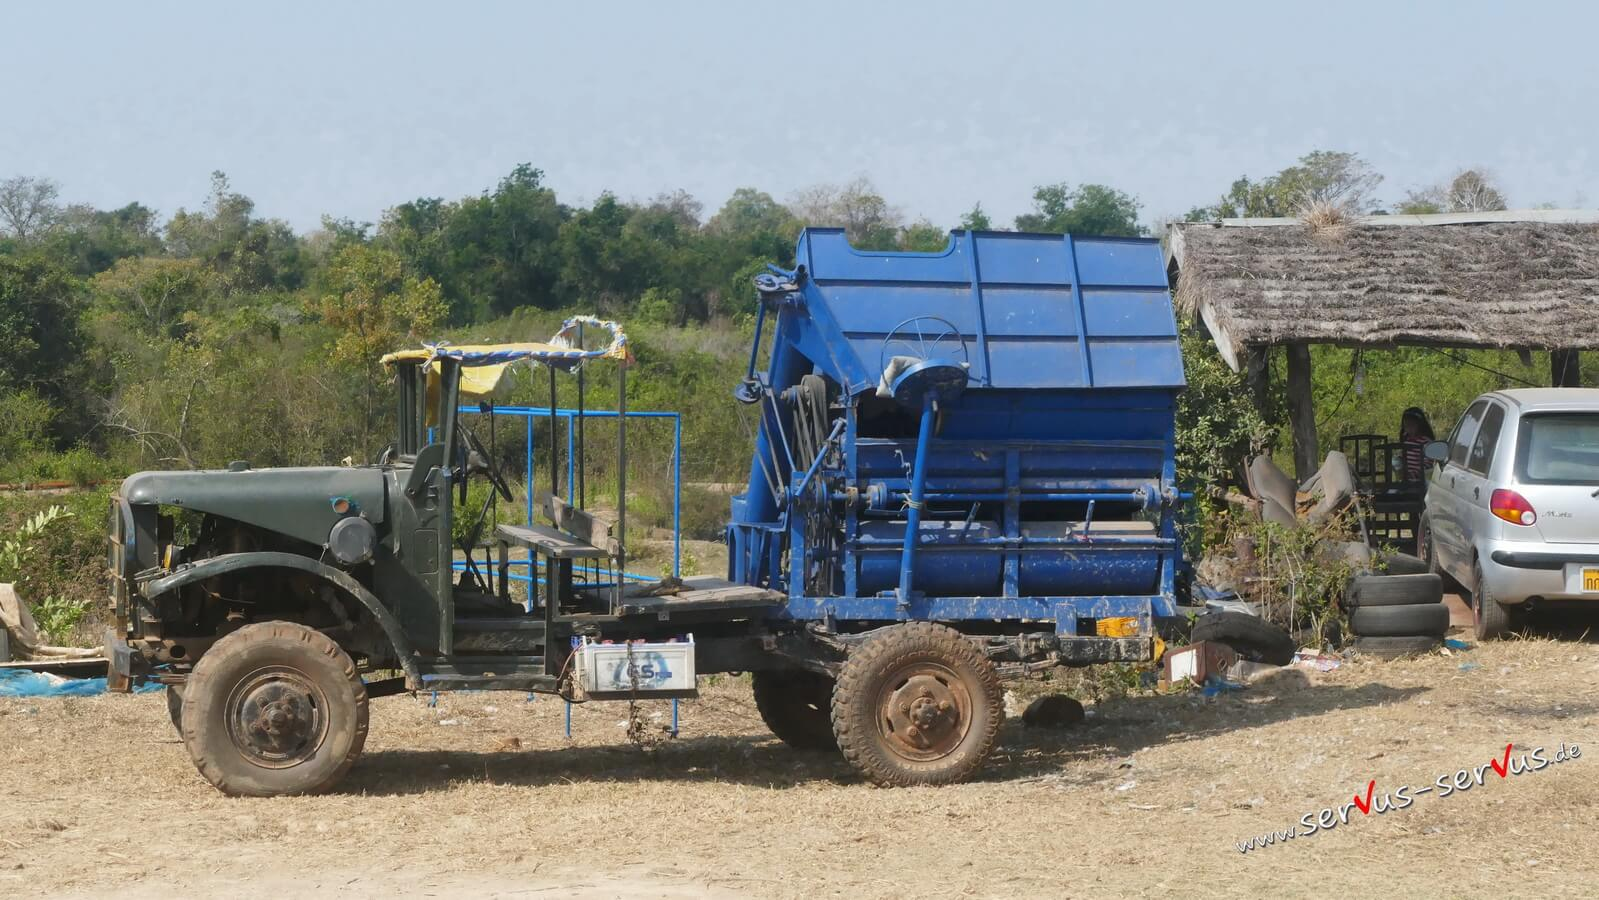 Umgebautes Fahrzeug in Laos